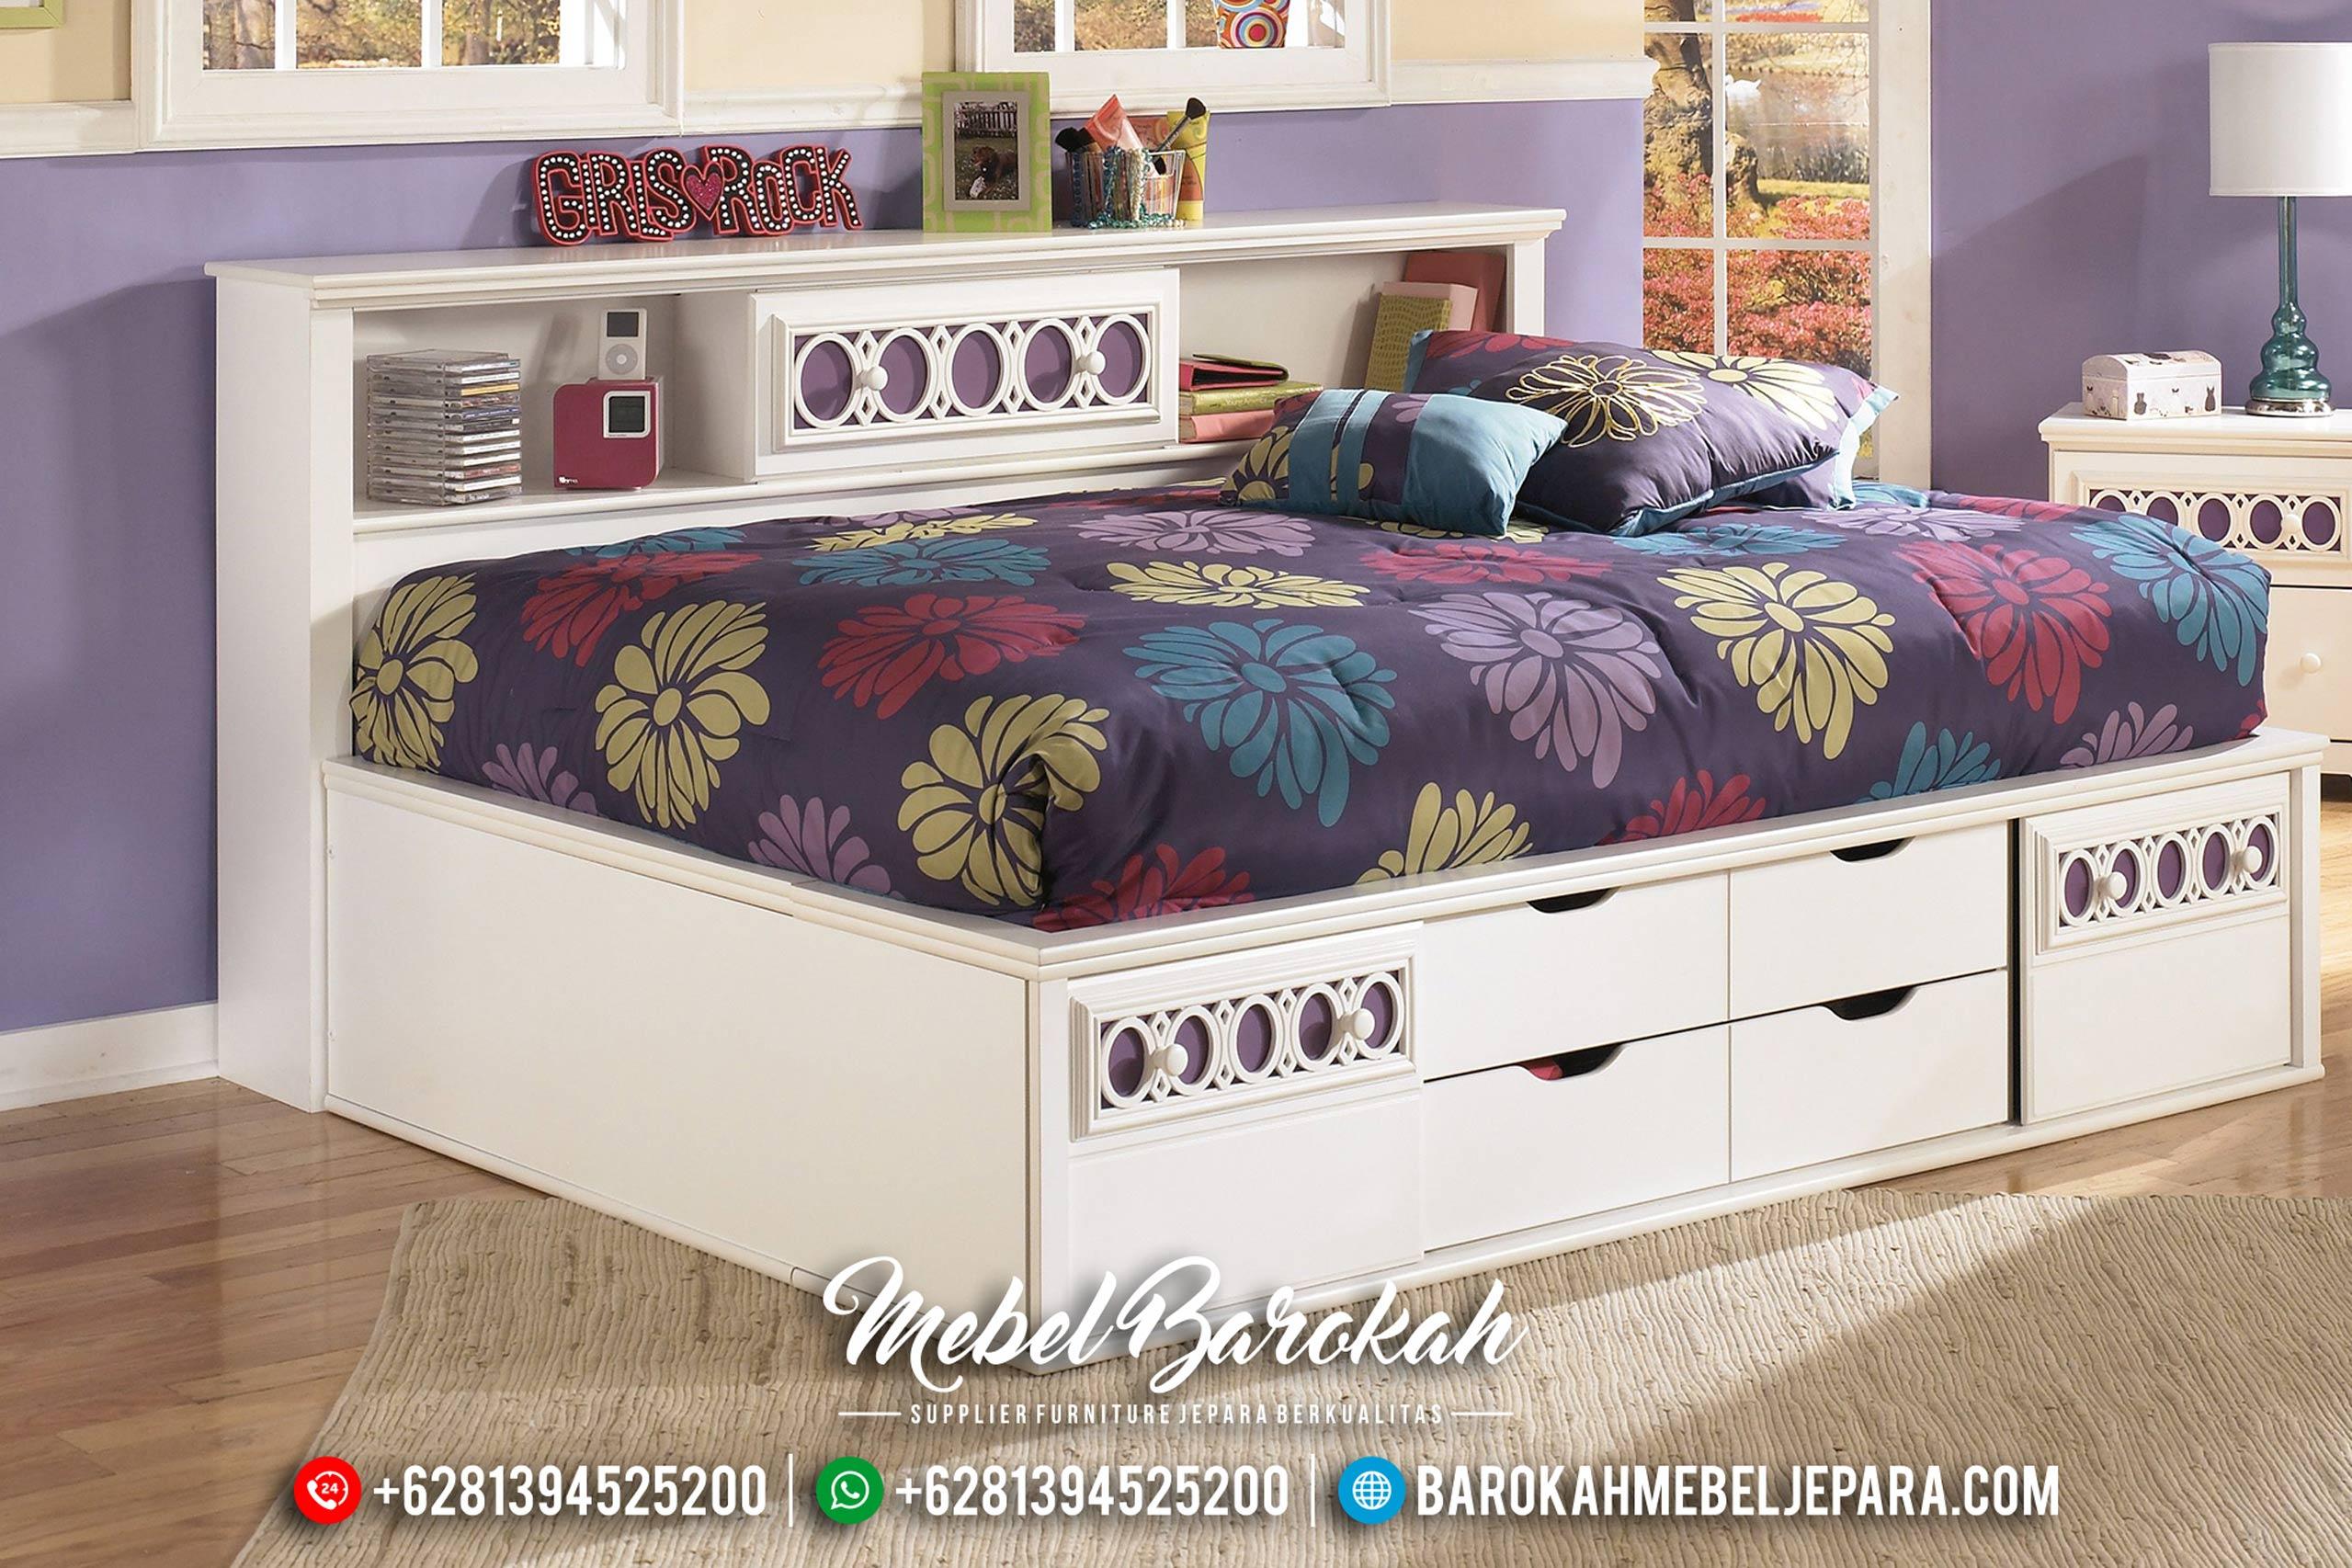 Harga Set Tempat Tidur Anak New 2020 Modern Minimalis Type MB-0447